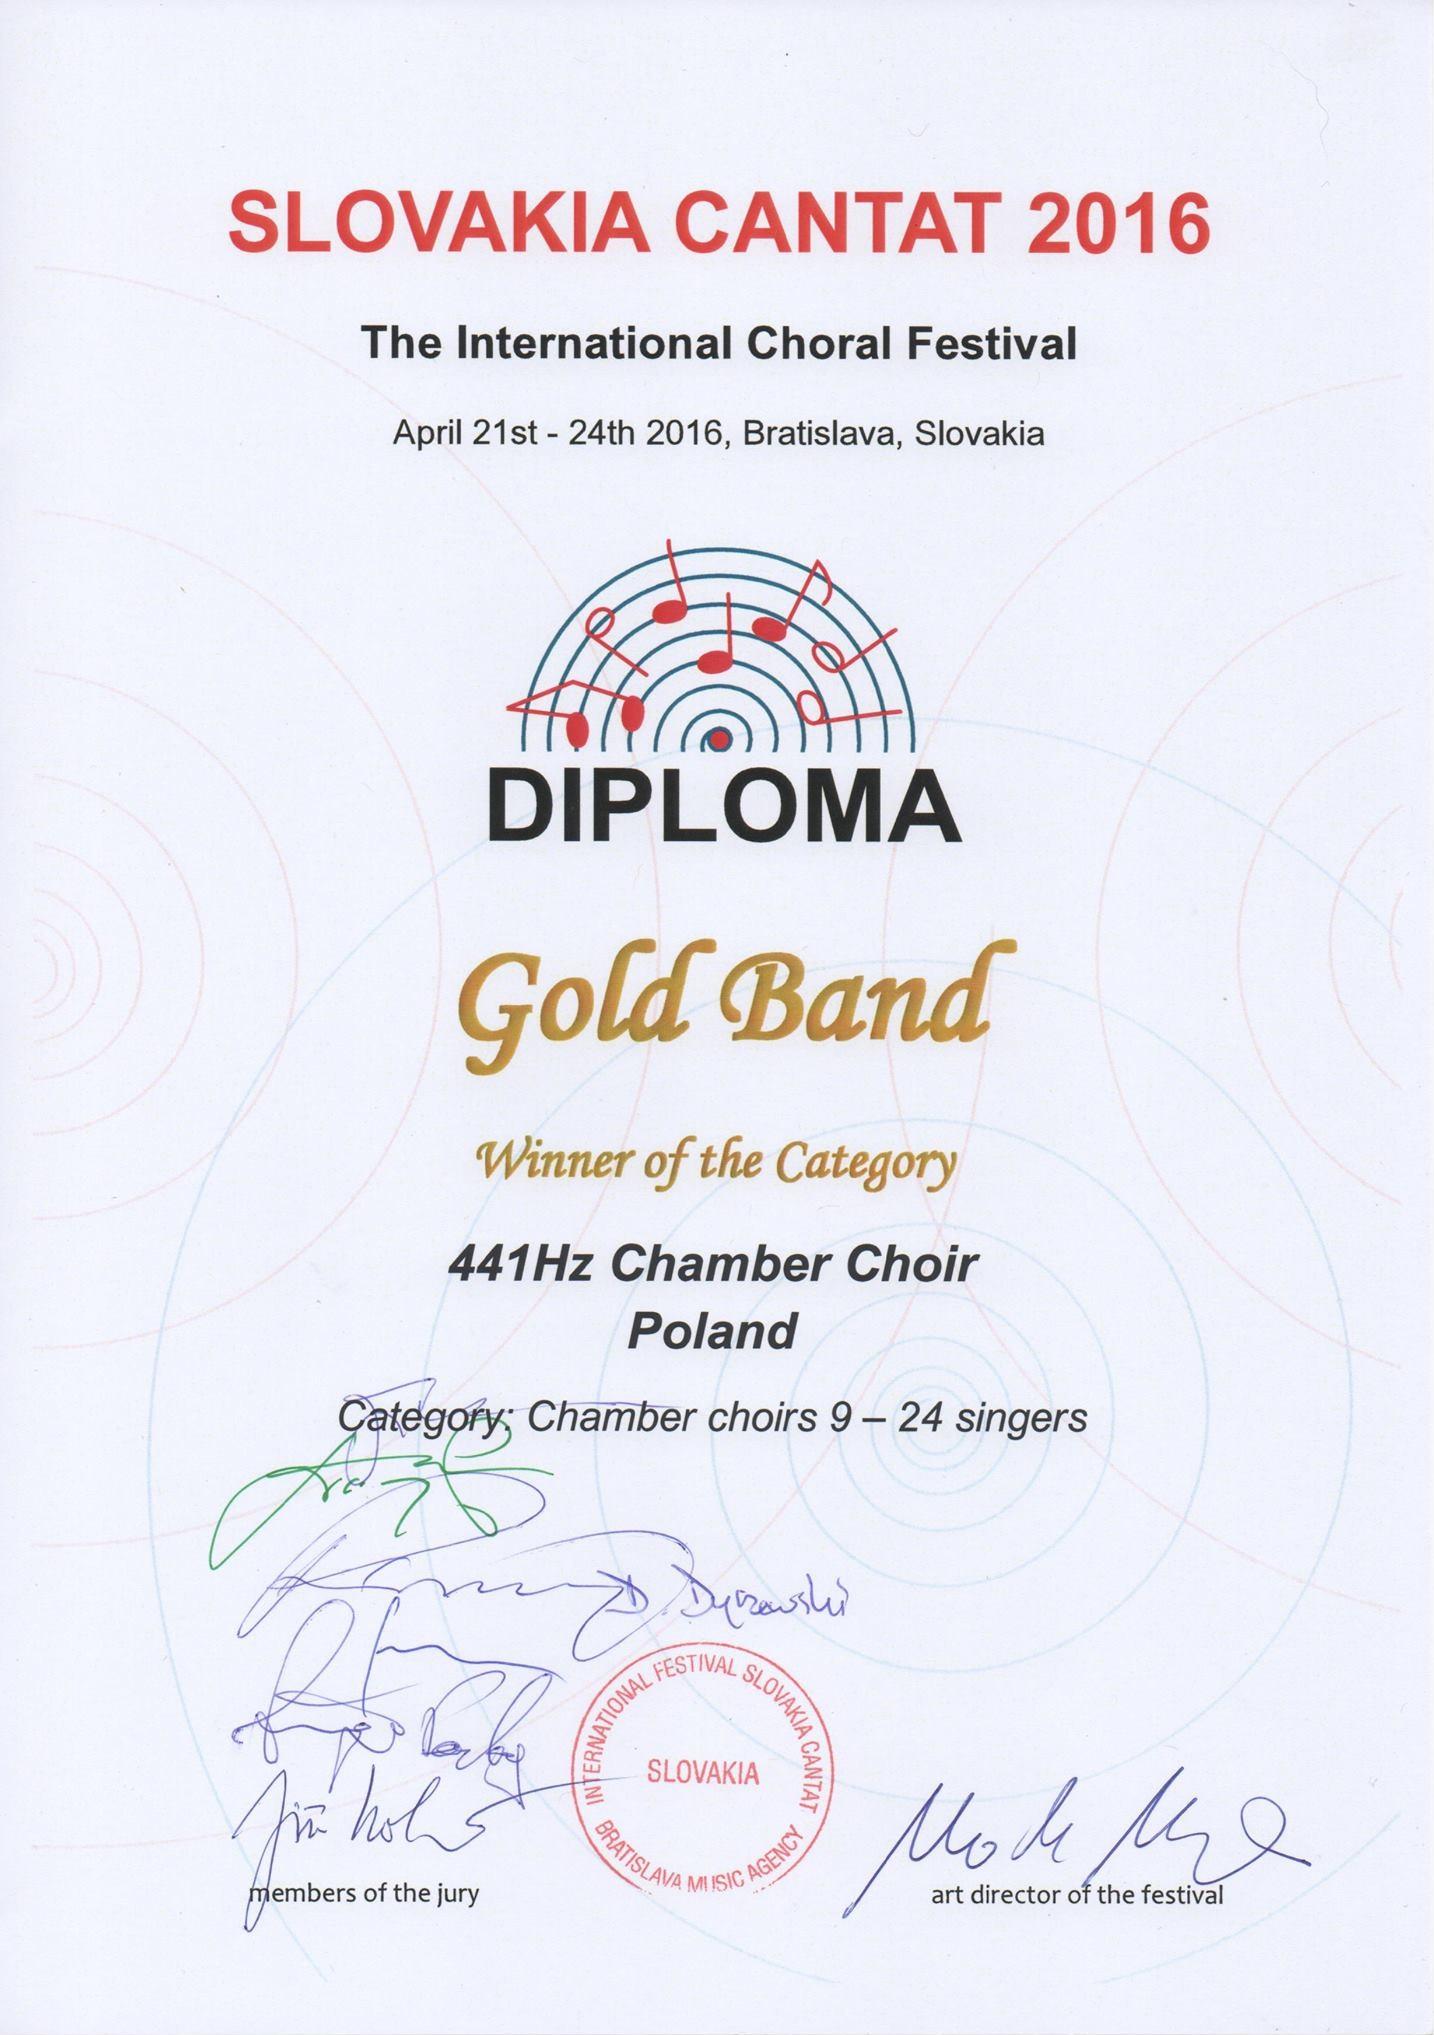 441Hz_Slovakia_Cantat_2016_chamber choirs